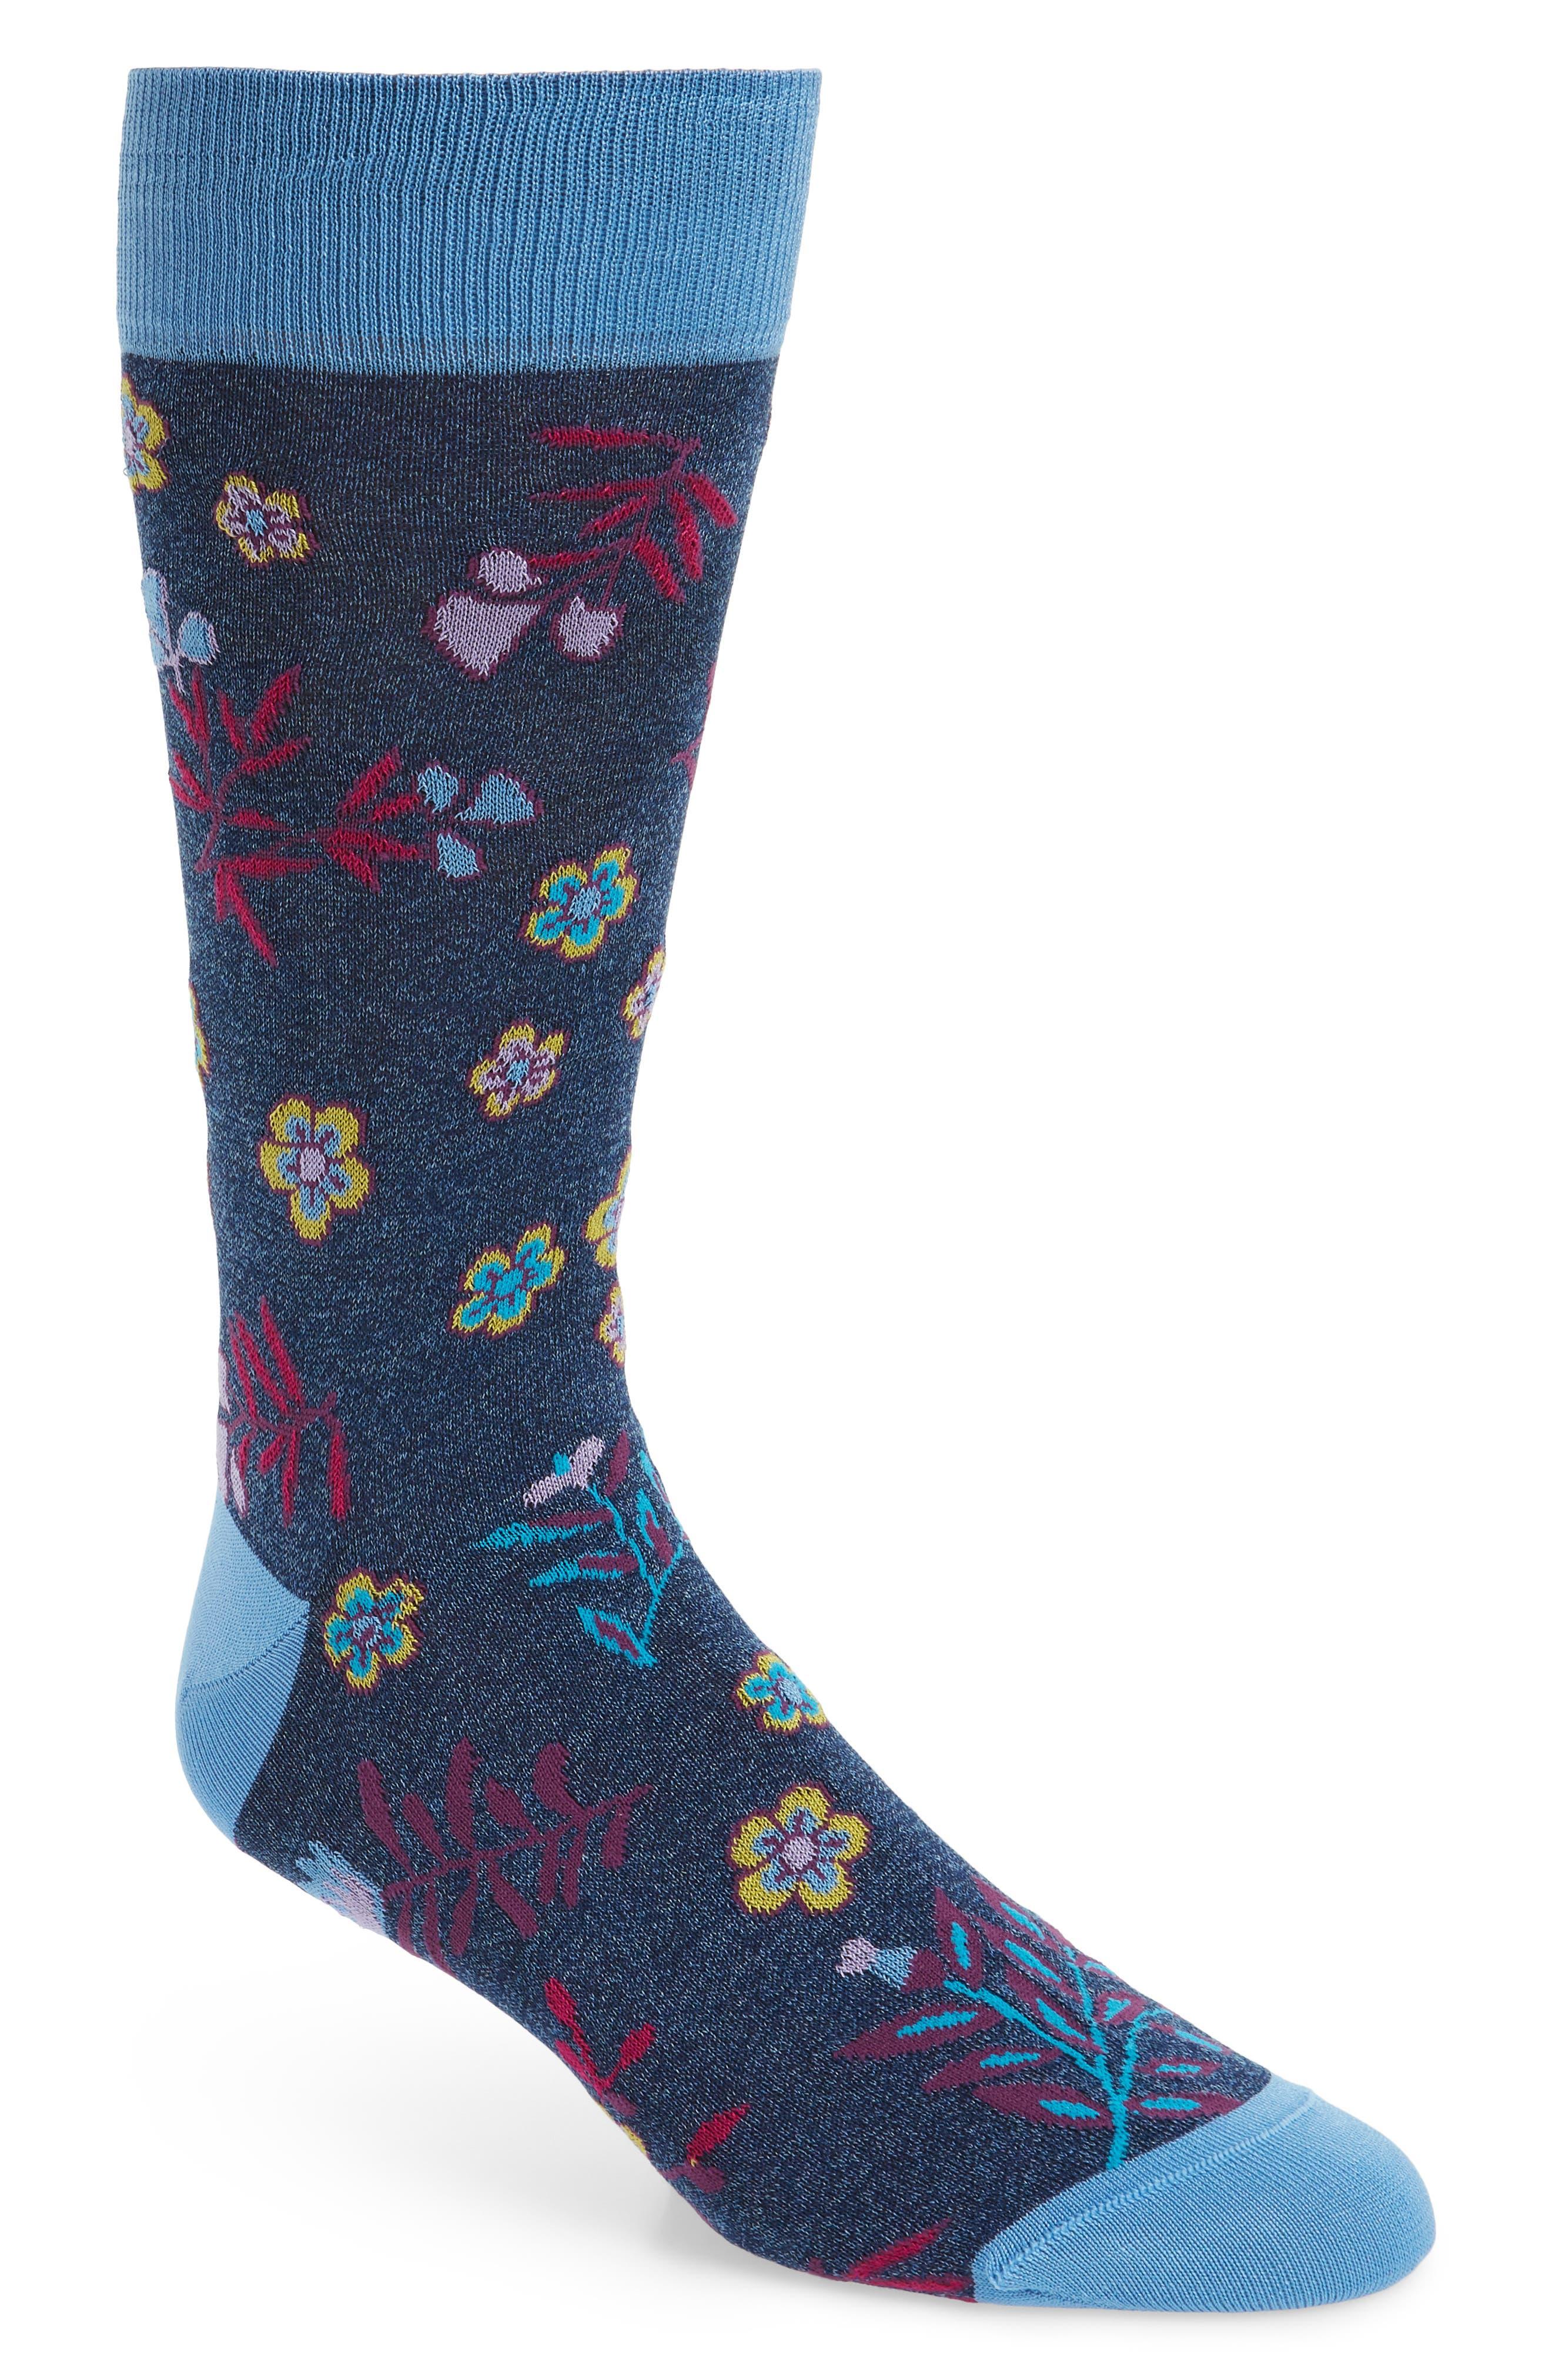 Cotton Blend Socks,                             Main thumbnail 1, color,                             423